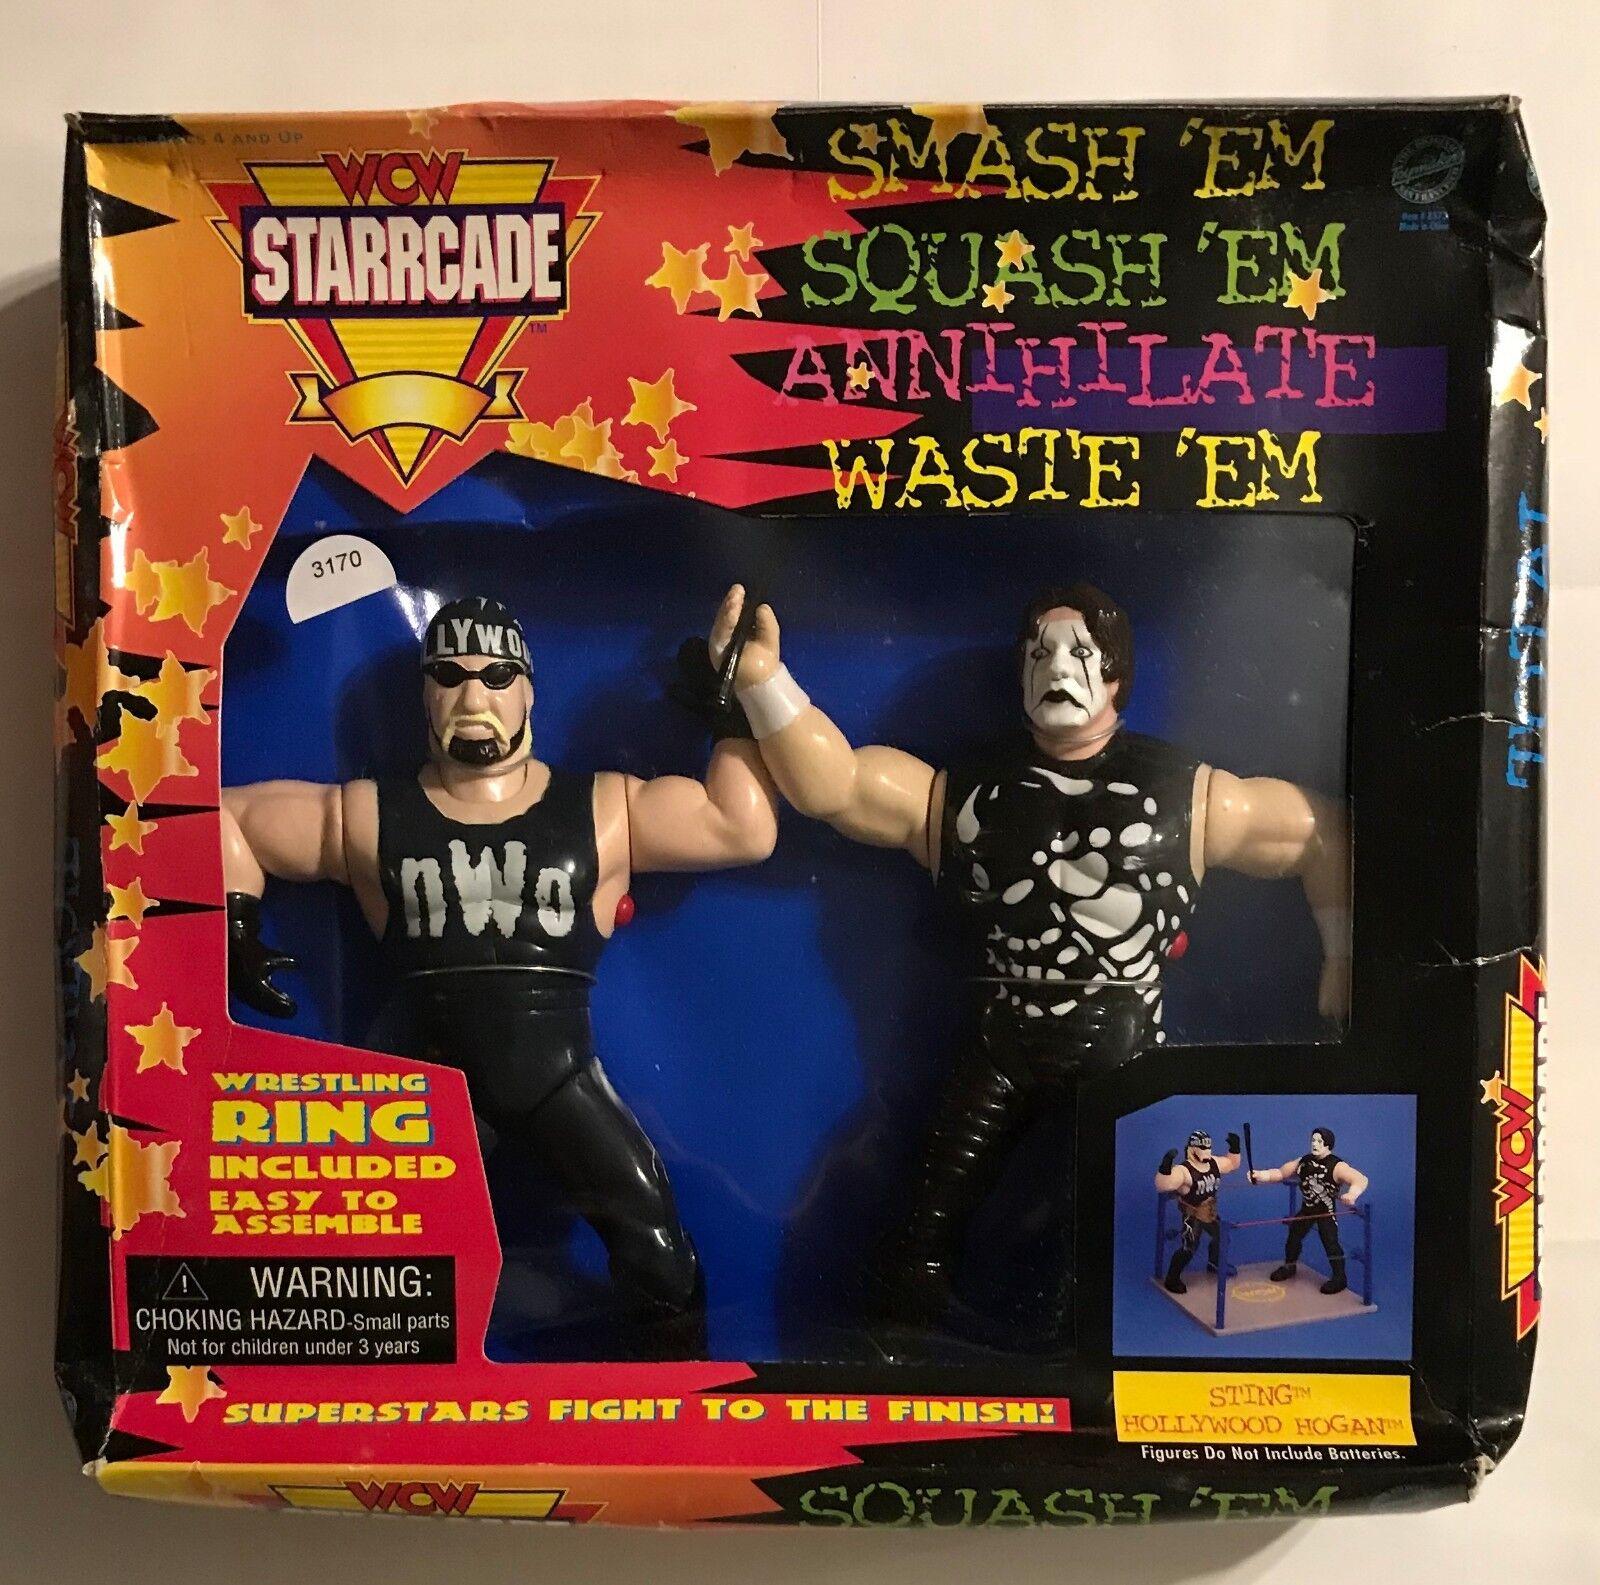 1997 WCW STARCADE RING  w HOLLYWOOD HOGAN HOGAN HOGAN & STING  w REAL SOUNDS - NEW e3d47d